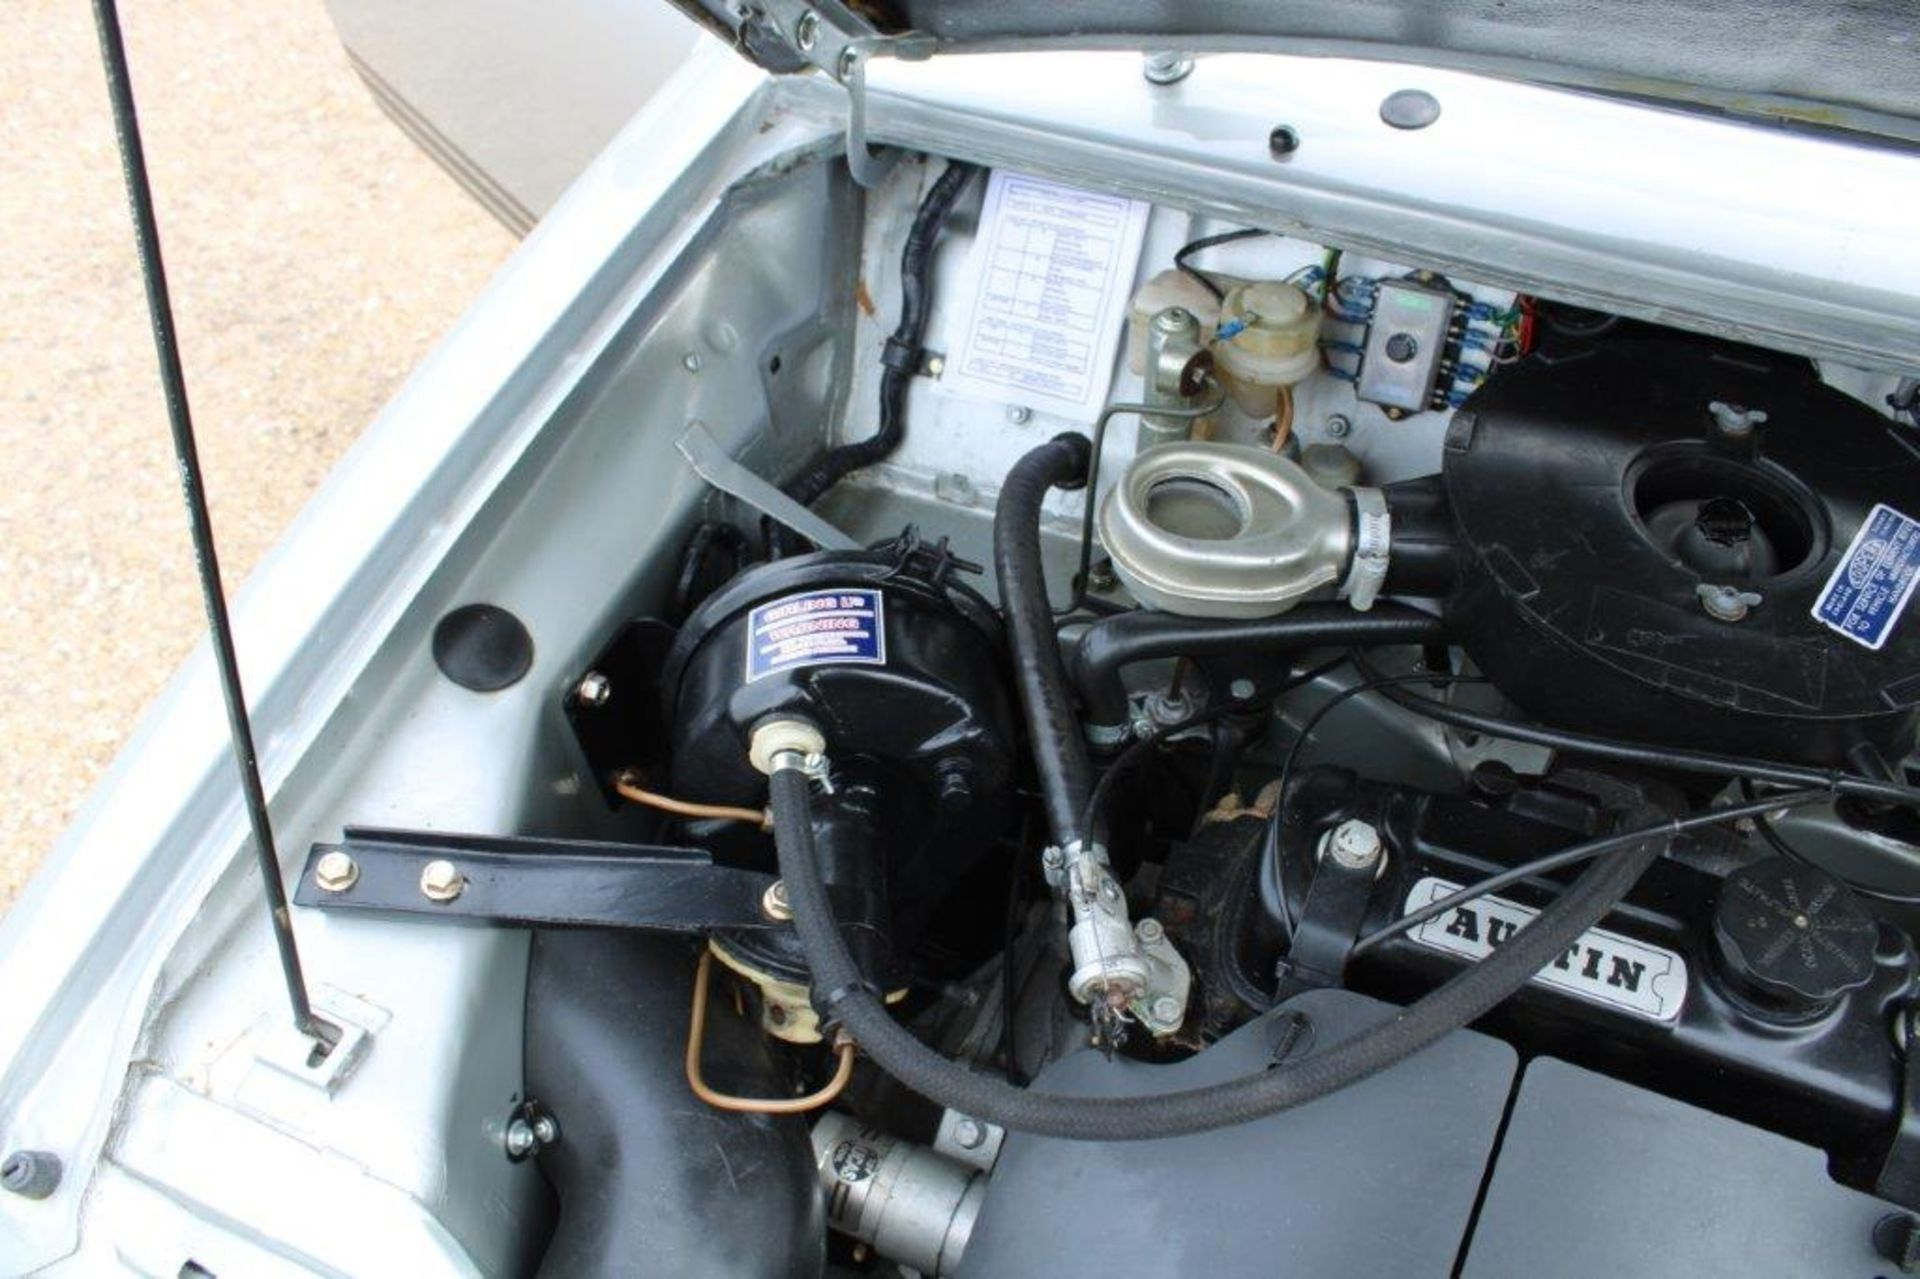 1980 Austin Morris Mini 1275 GT - Image 24 of 28